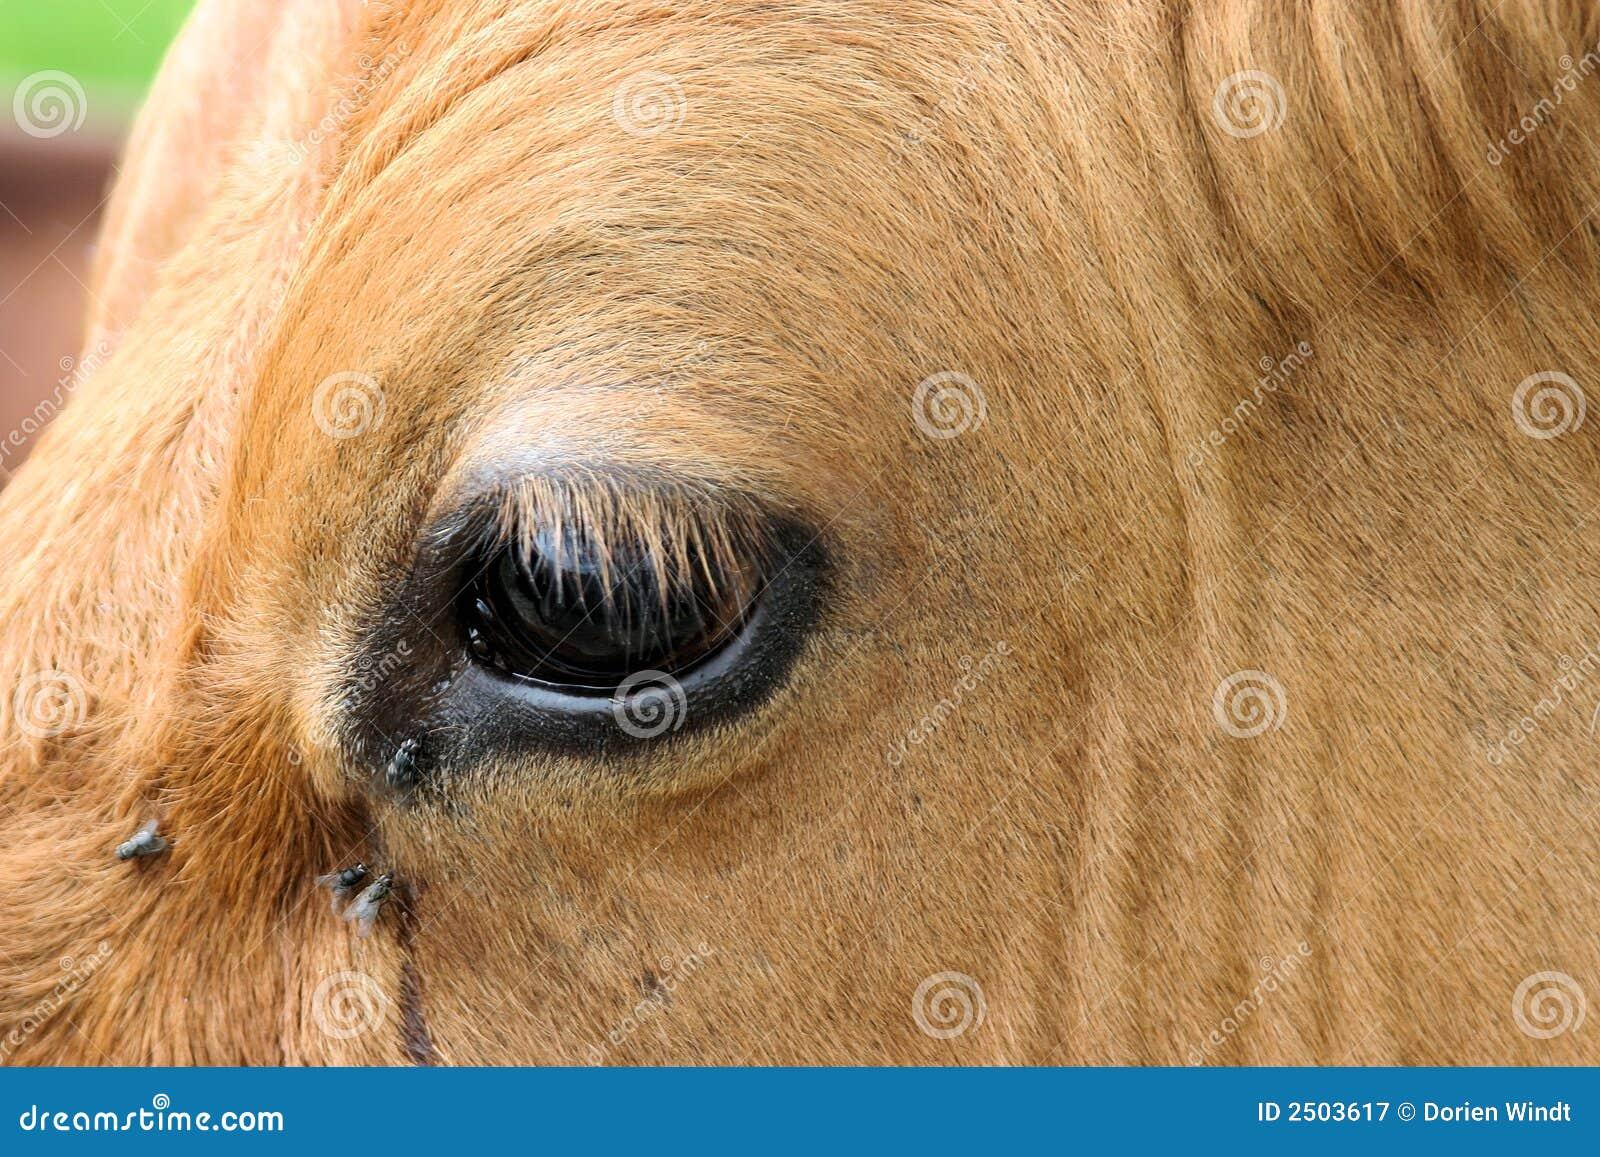 cow eye royalty free stock photography image 2503617 eyeball clip art free eyeball clip art attention